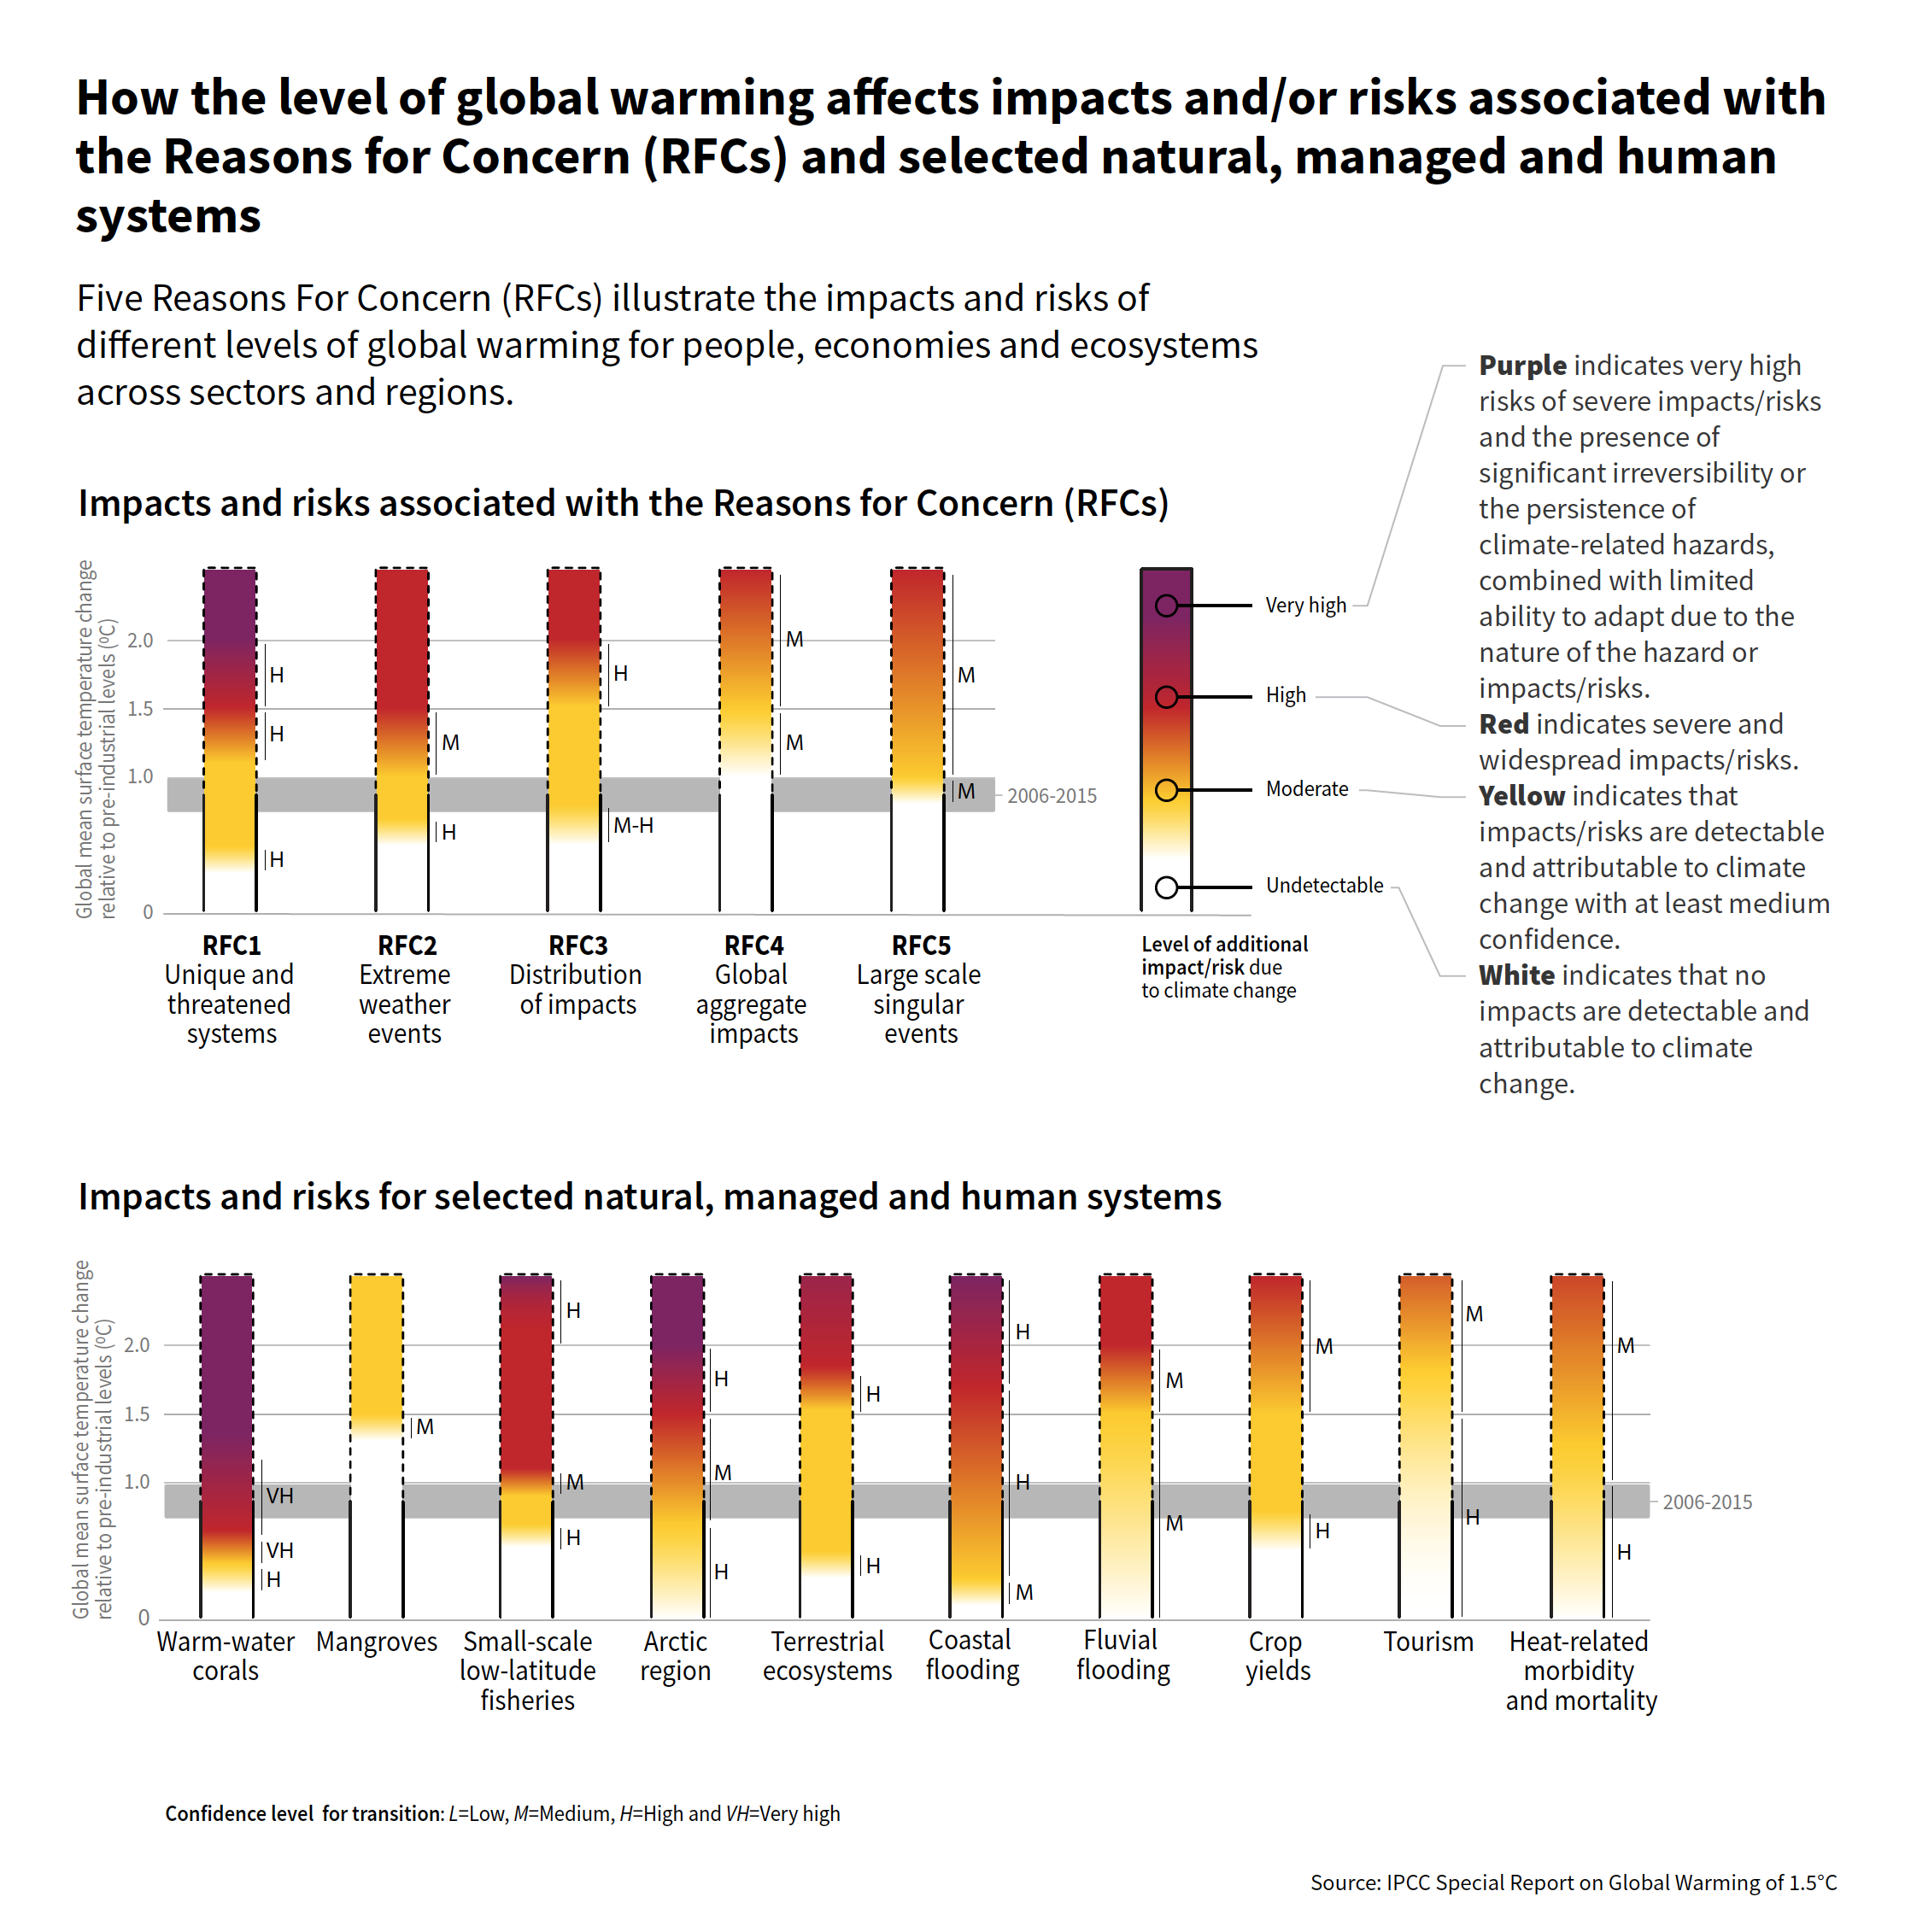 IPCC Five Reasons For Concern (RFCs) illustration